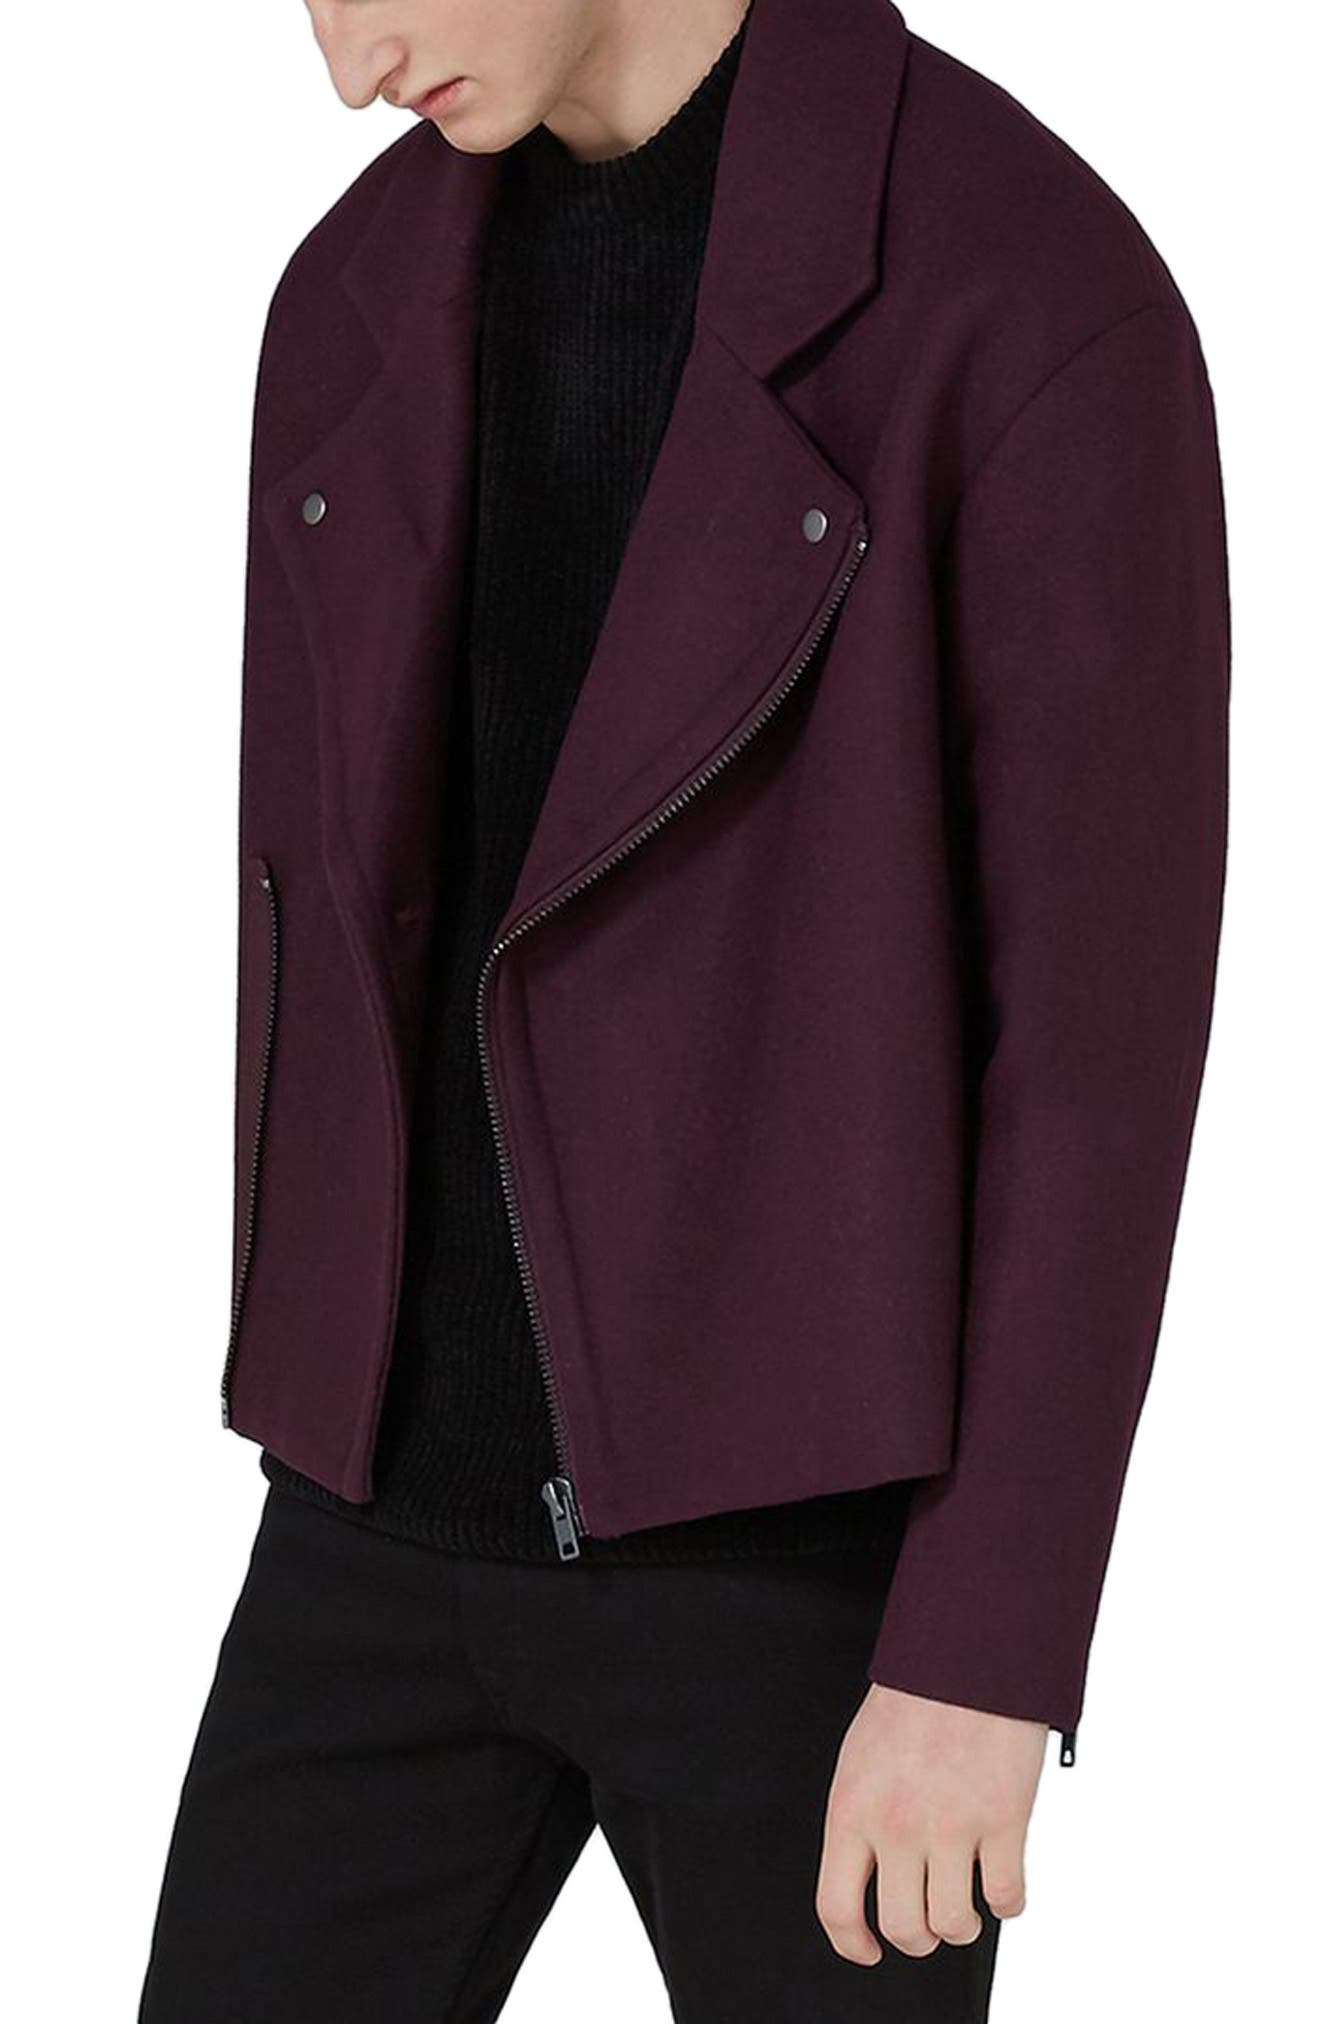 Wool Blend Biker Jacket,                             Main thumbnail 1, color,                             930